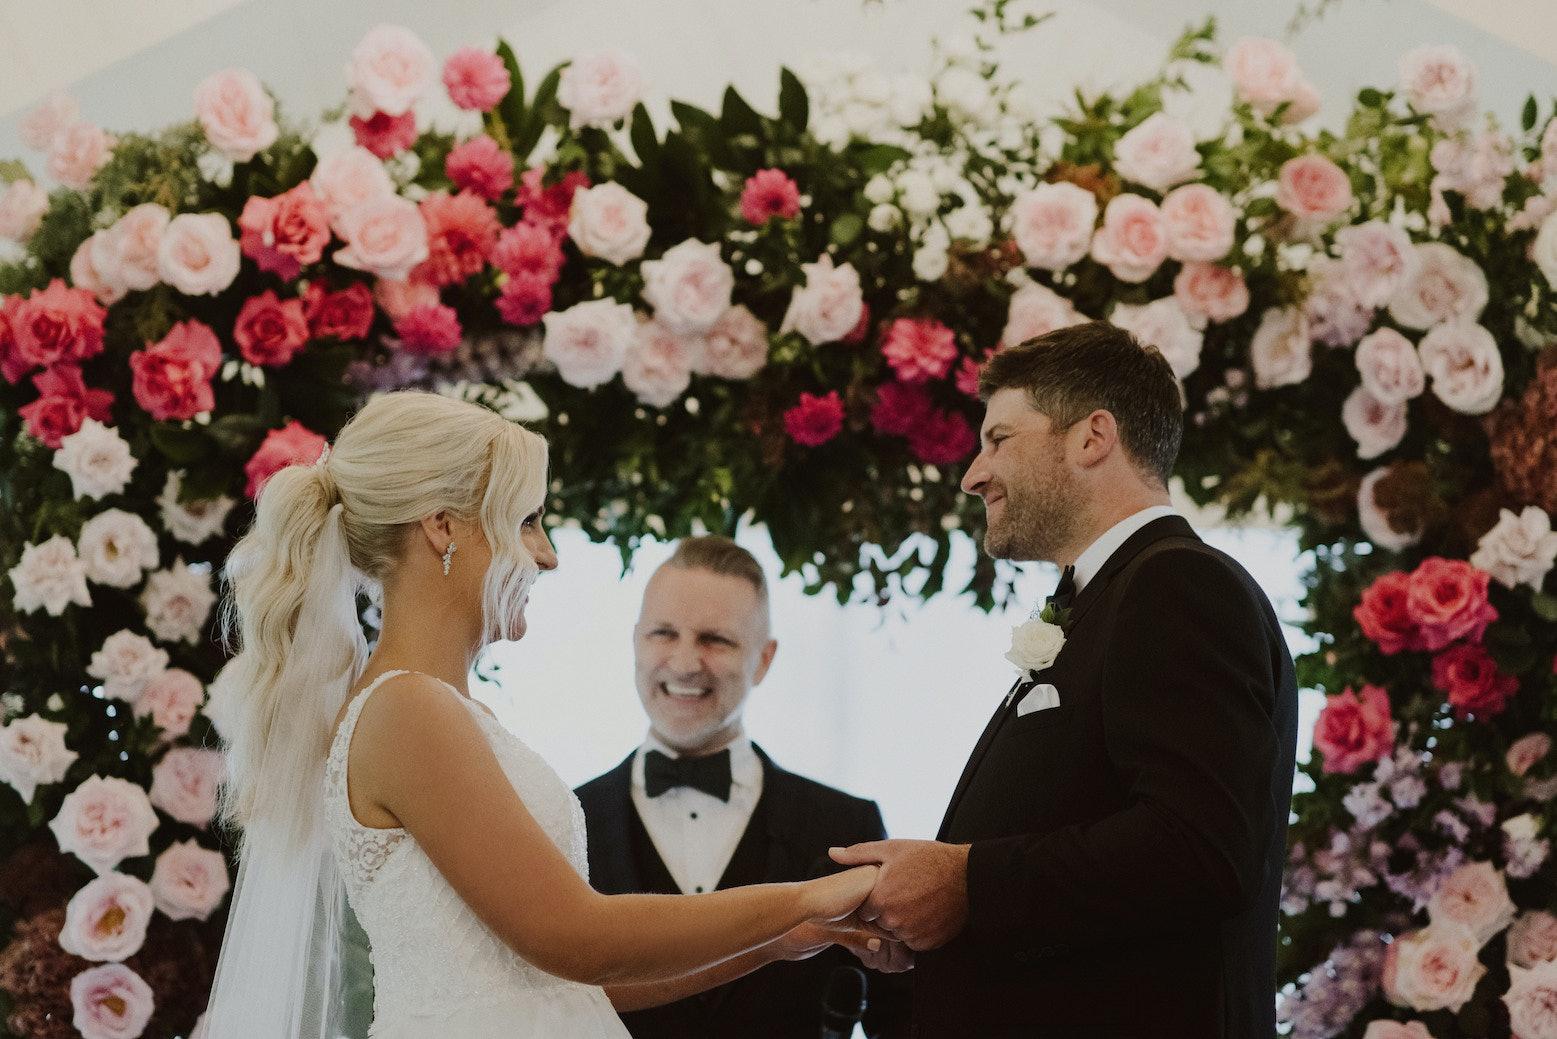 Bride and groom standing together at altar